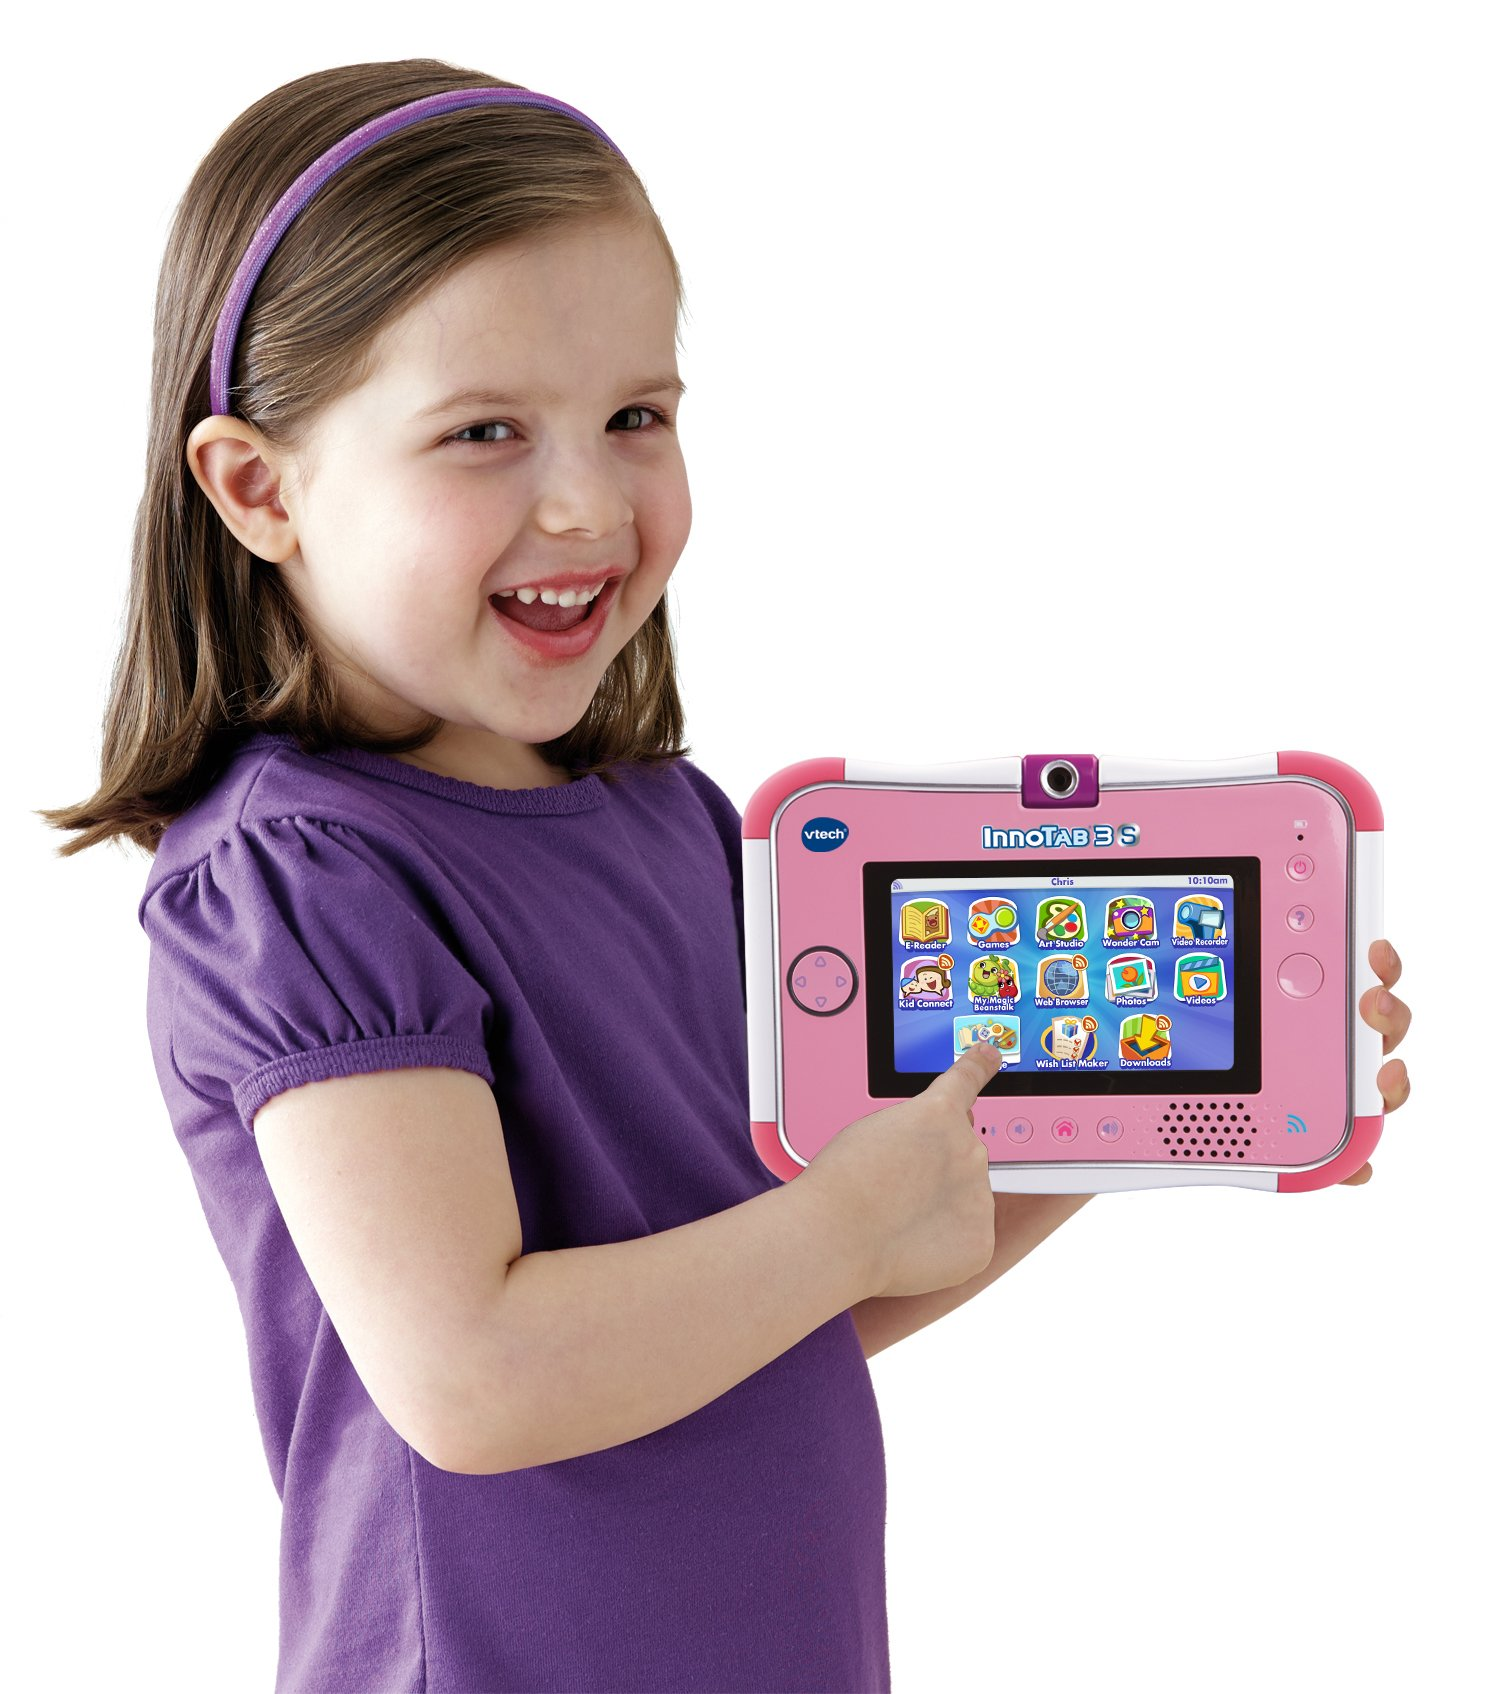 VTech InnoTab 3S Kids Tablet, Pink by VTech (Image #3)